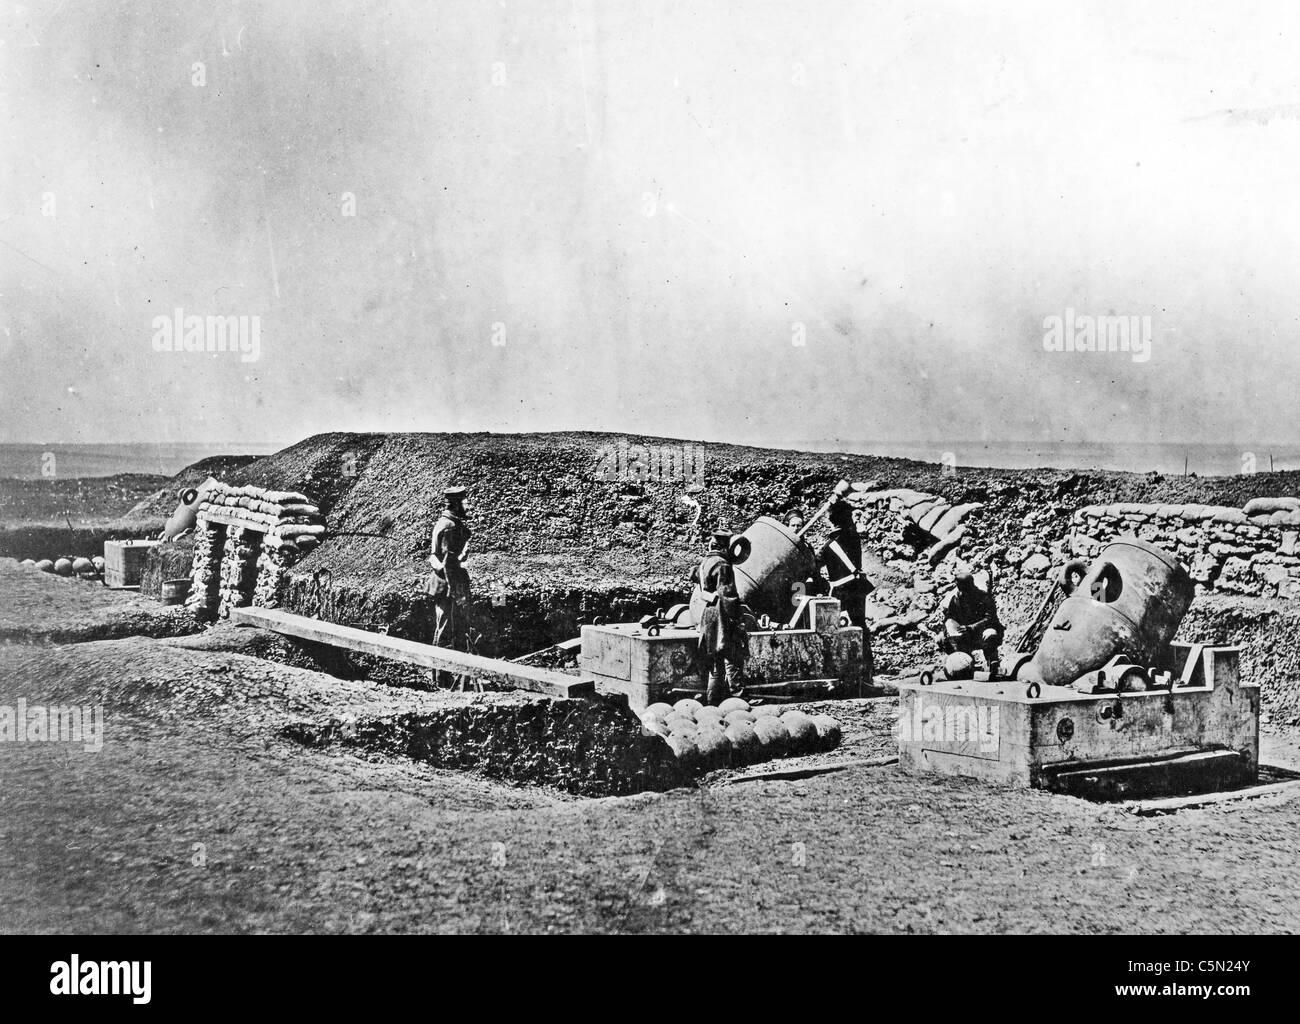 CRIMEAN WAR (1853-1856) British army mortar battery. Photo Roger Fenton - Stock Image